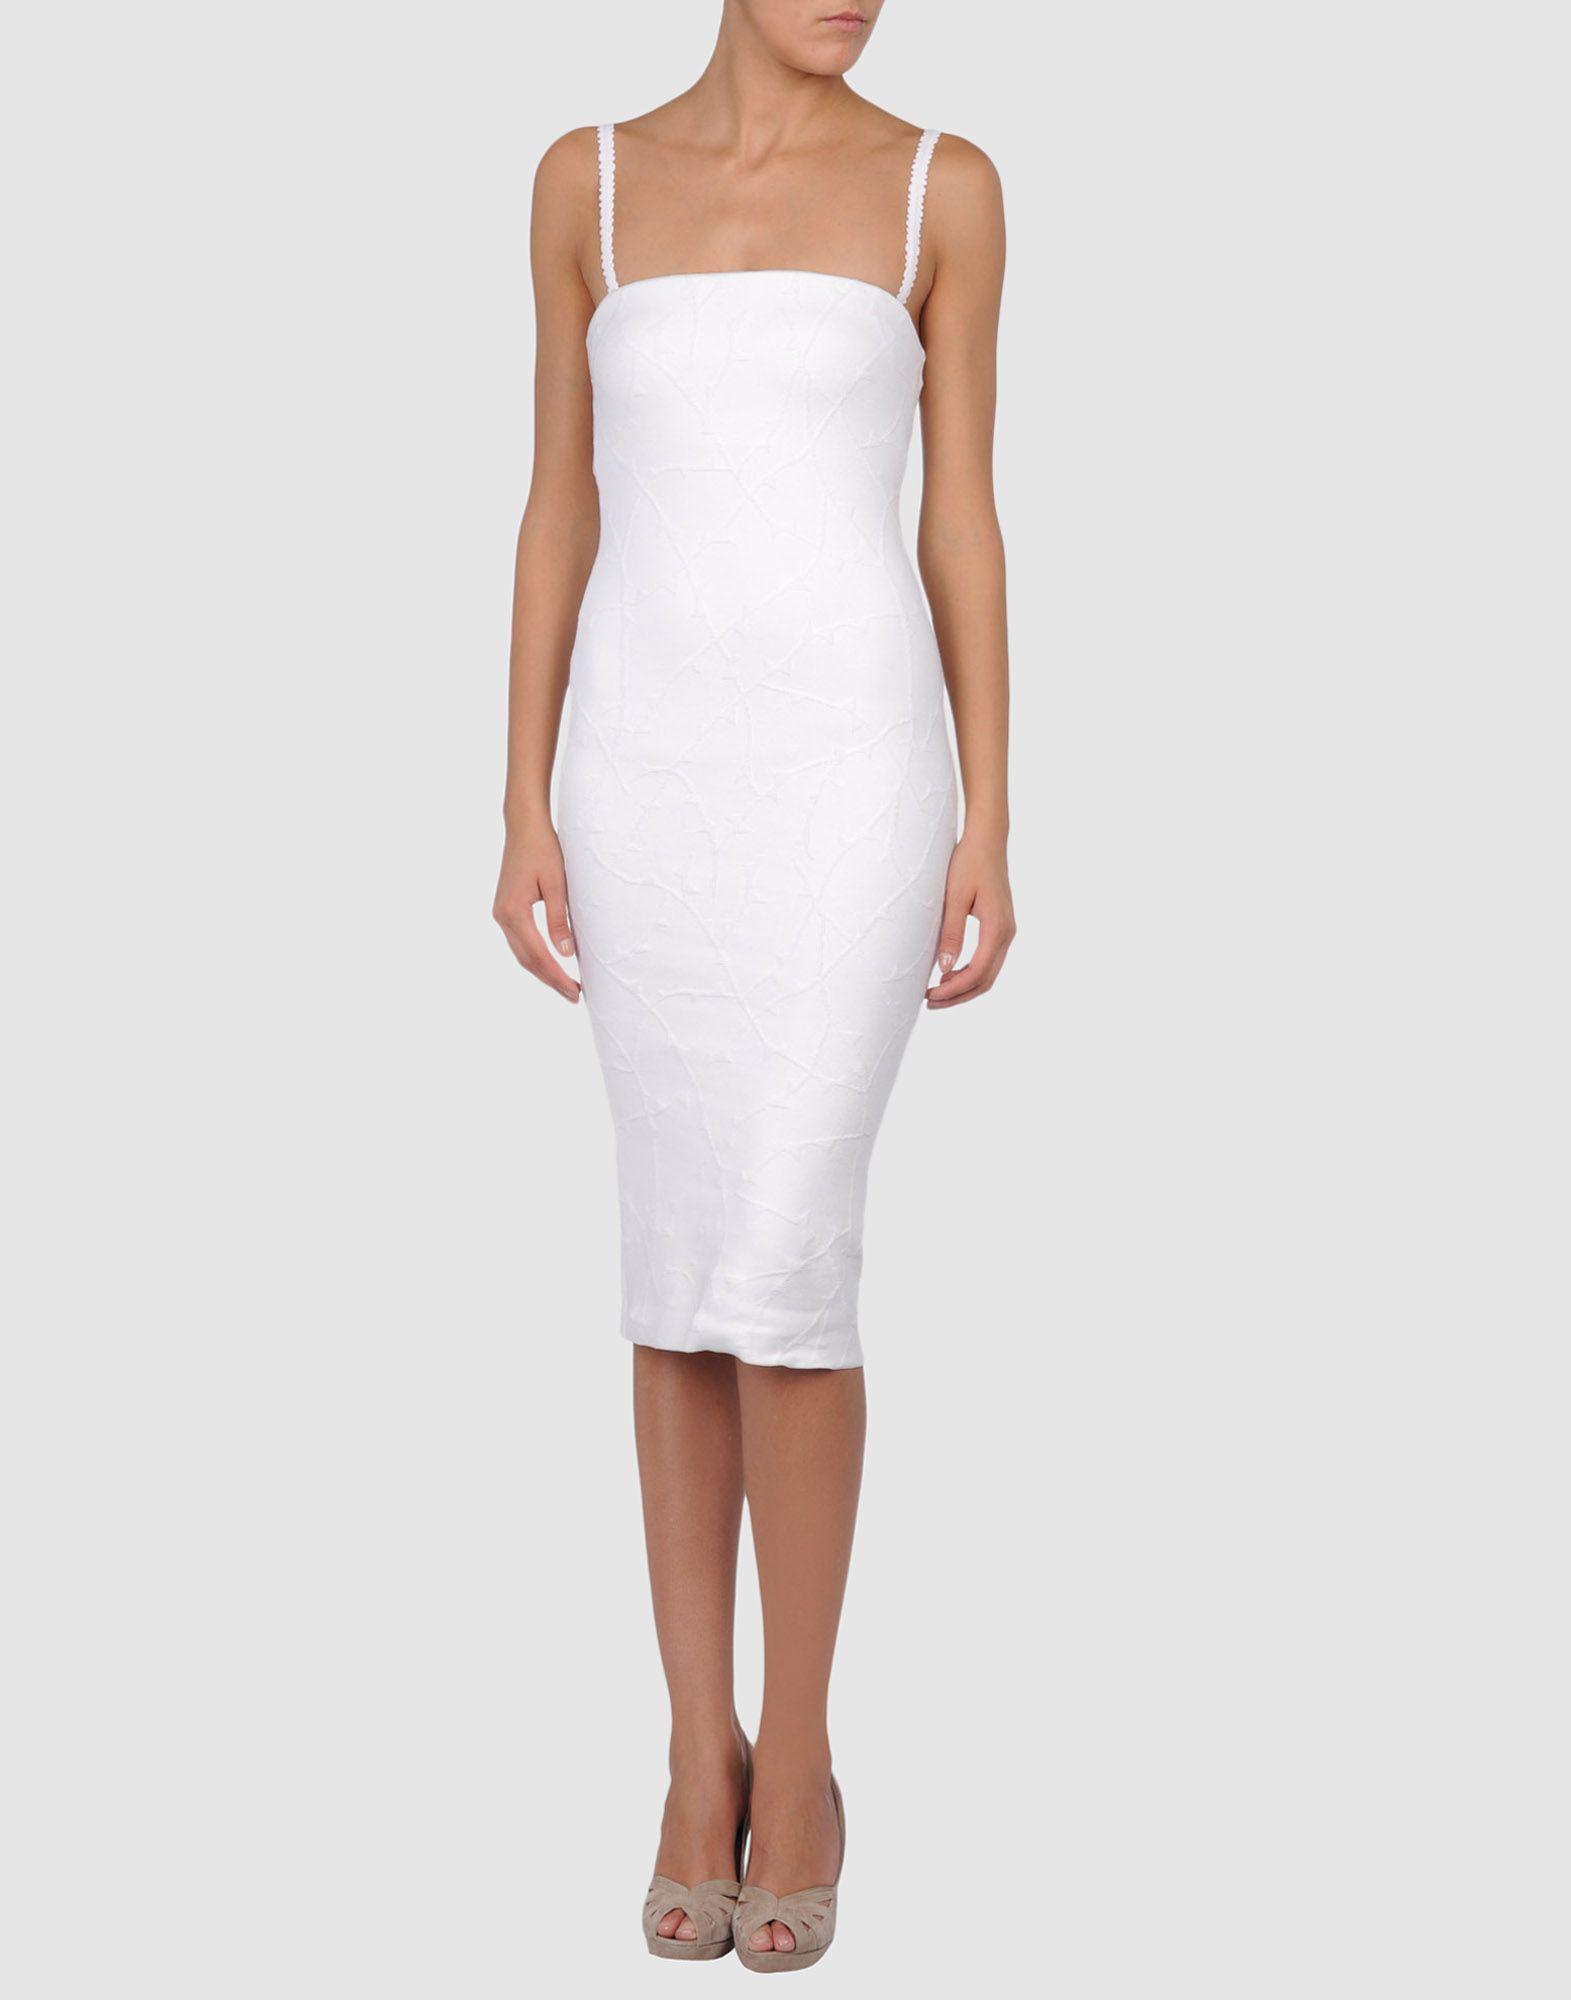 34222369FS 14 f - Βραδυνα Φορεματα Yves Saint Laurent Rive Gauche Κωδ.45